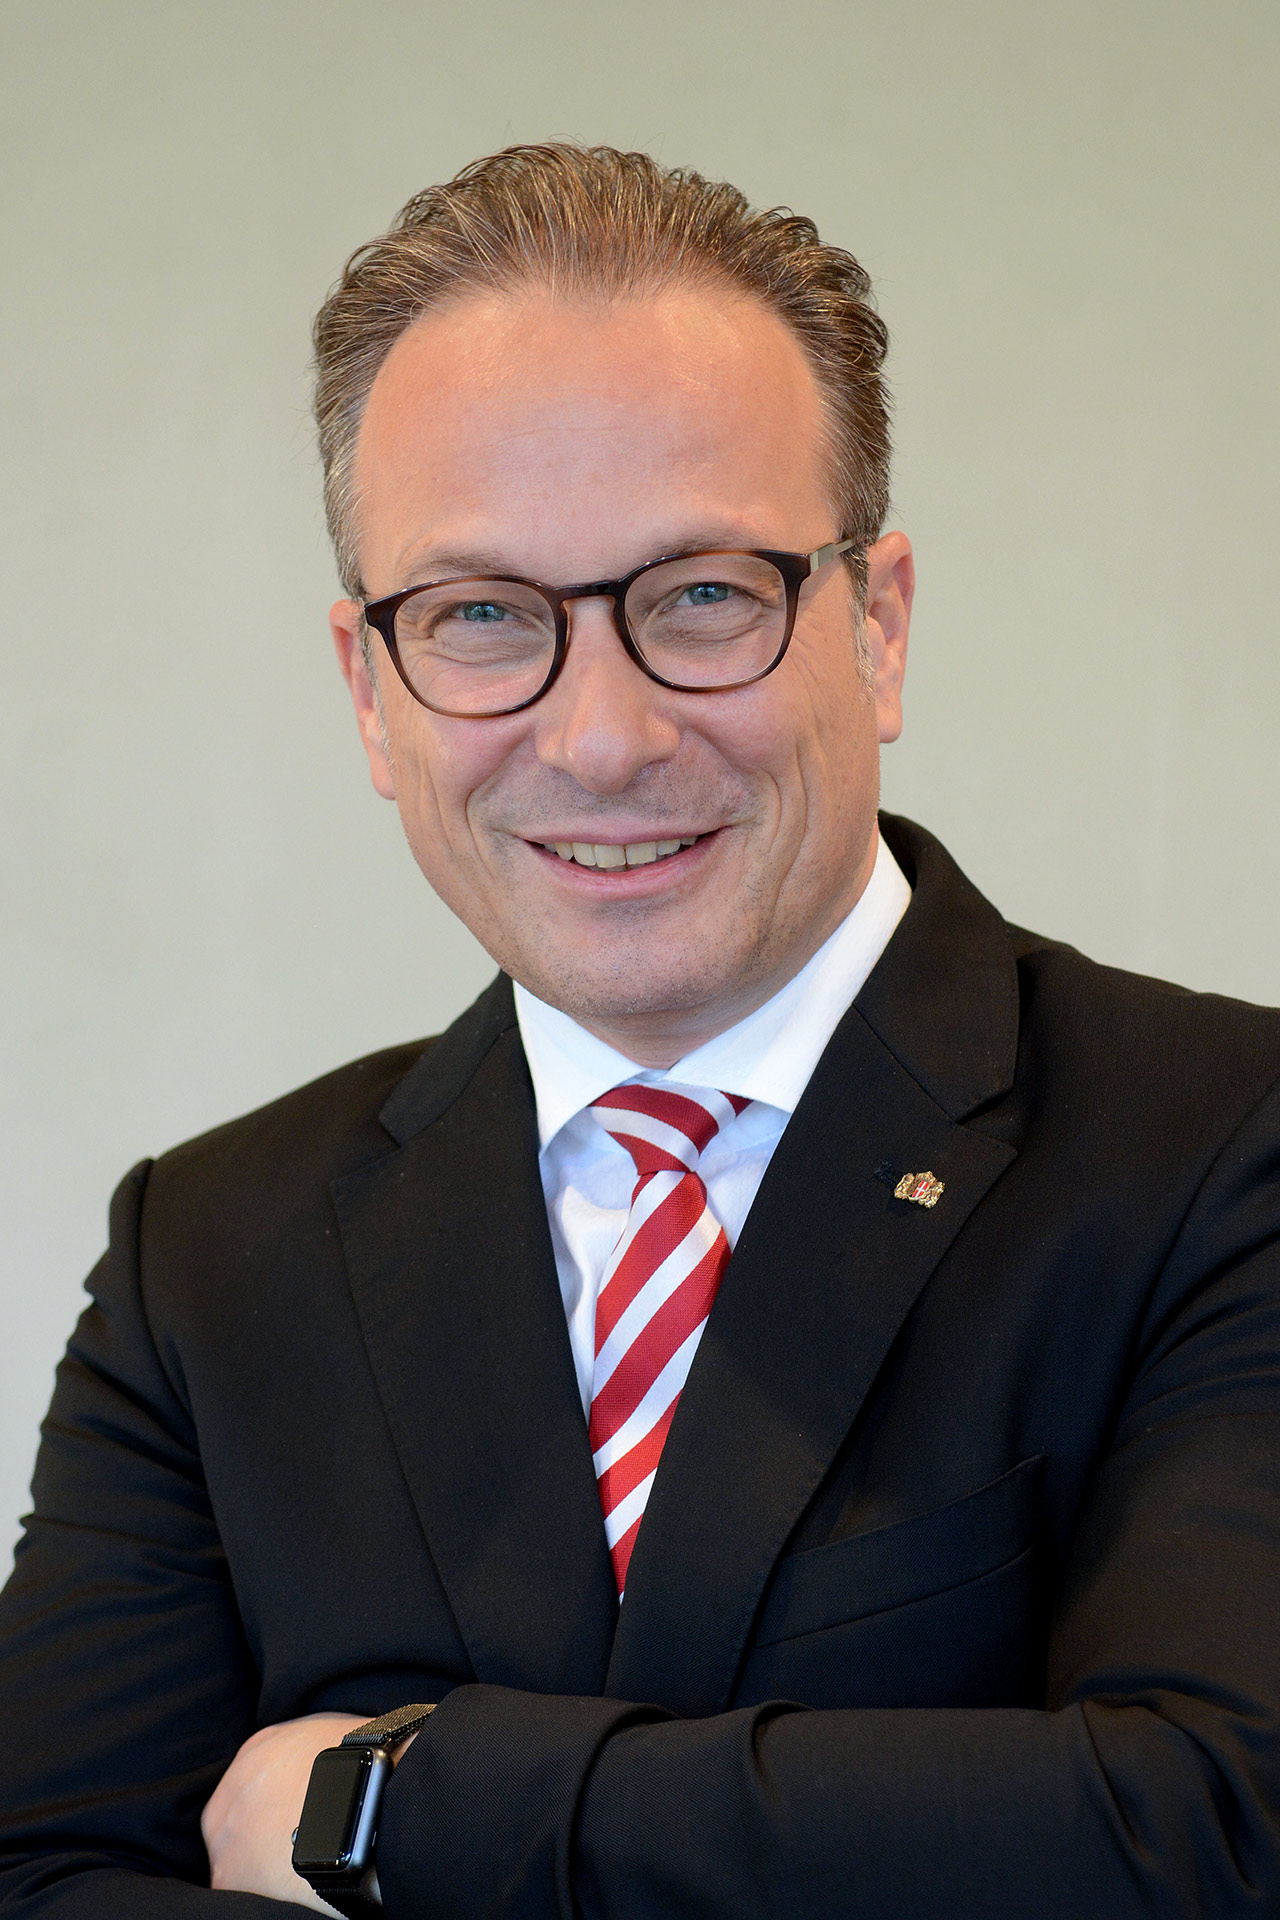 Bürgermeister Reiner Breuer